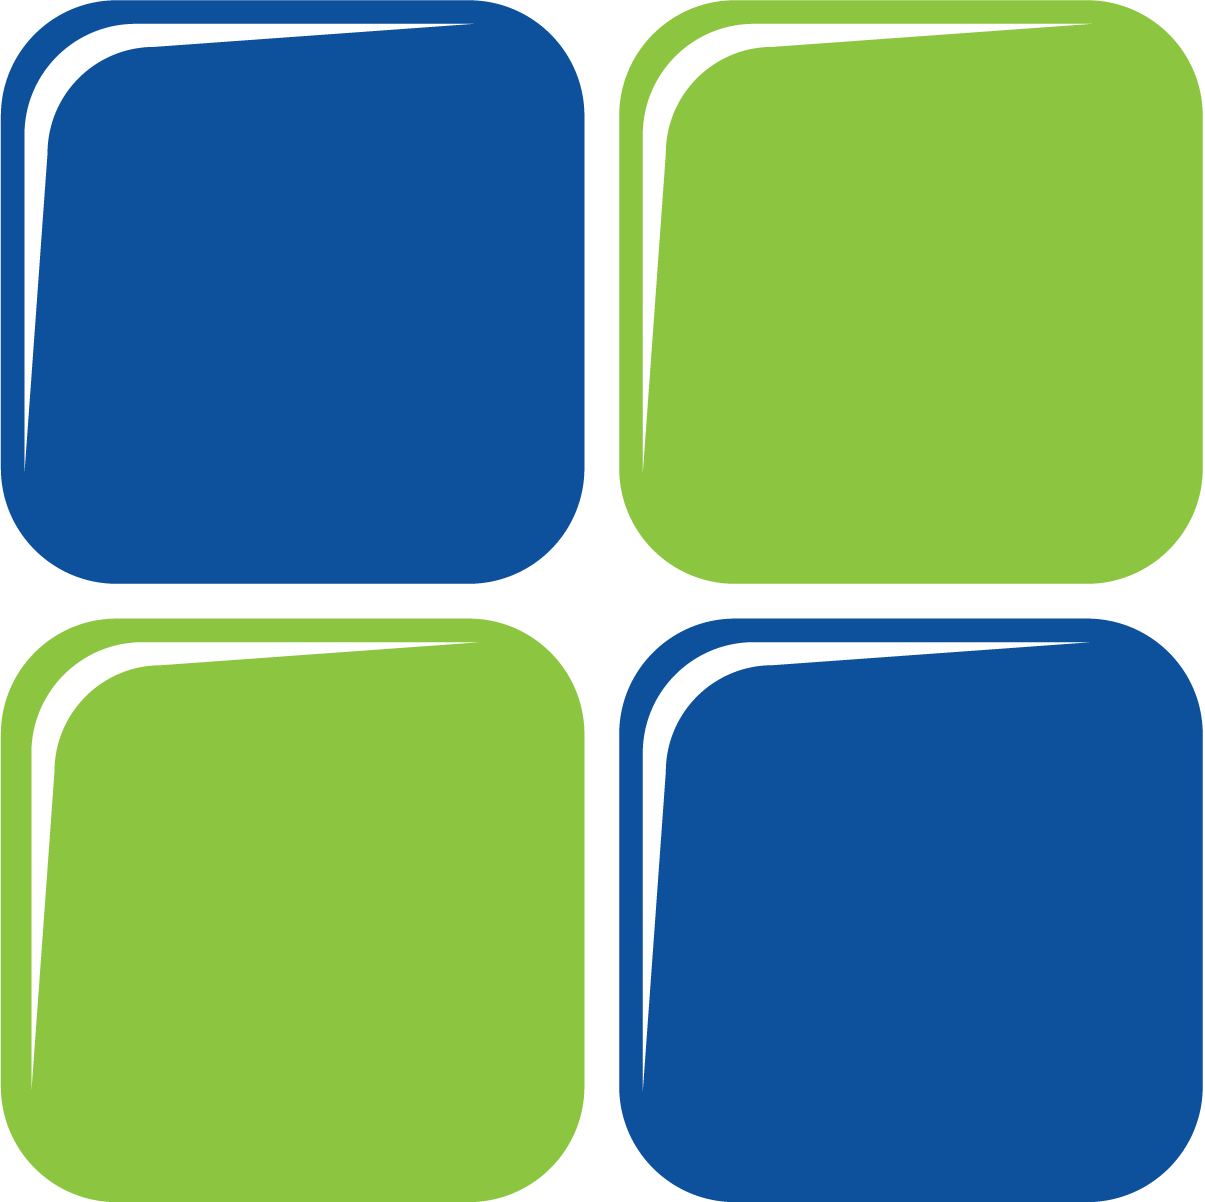 Matrix logo clipart graphic freeuse download File:Agency-Matrix-Logo.png - Wikimedia Commons graphic freeuse download